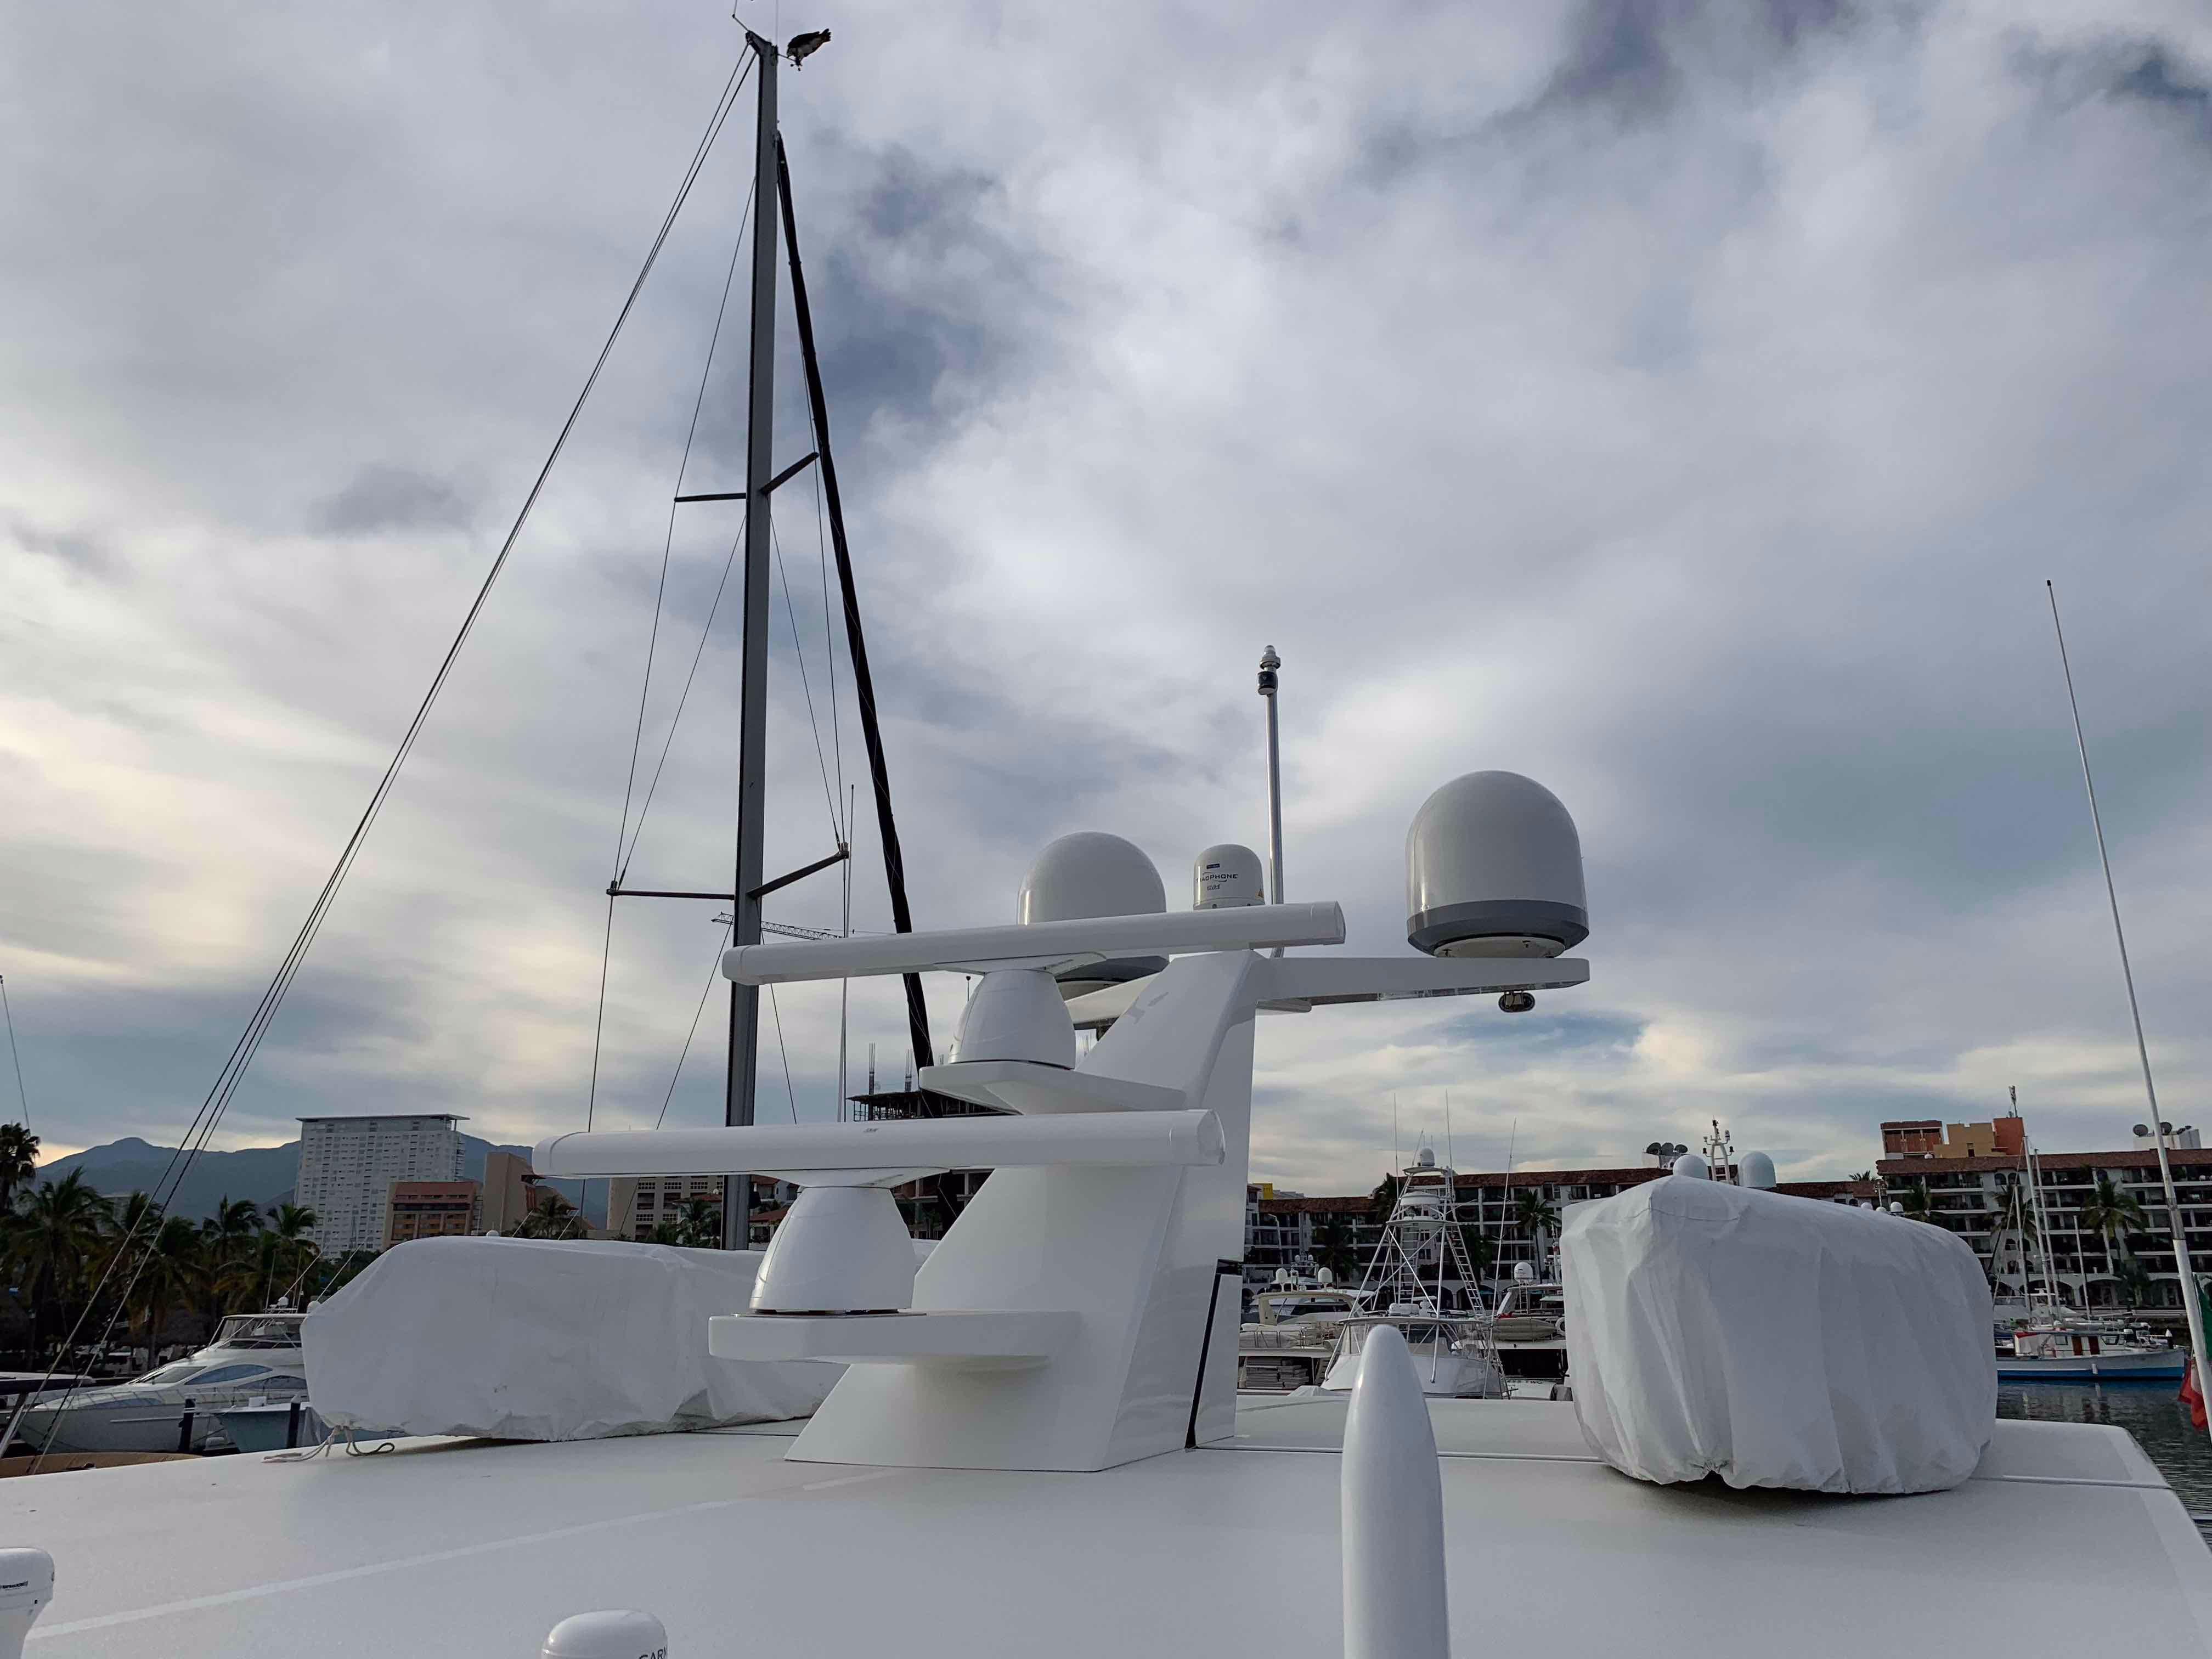 100 Ocean Alexander Factory custom 2 step mast with dual Garmin radar antennas